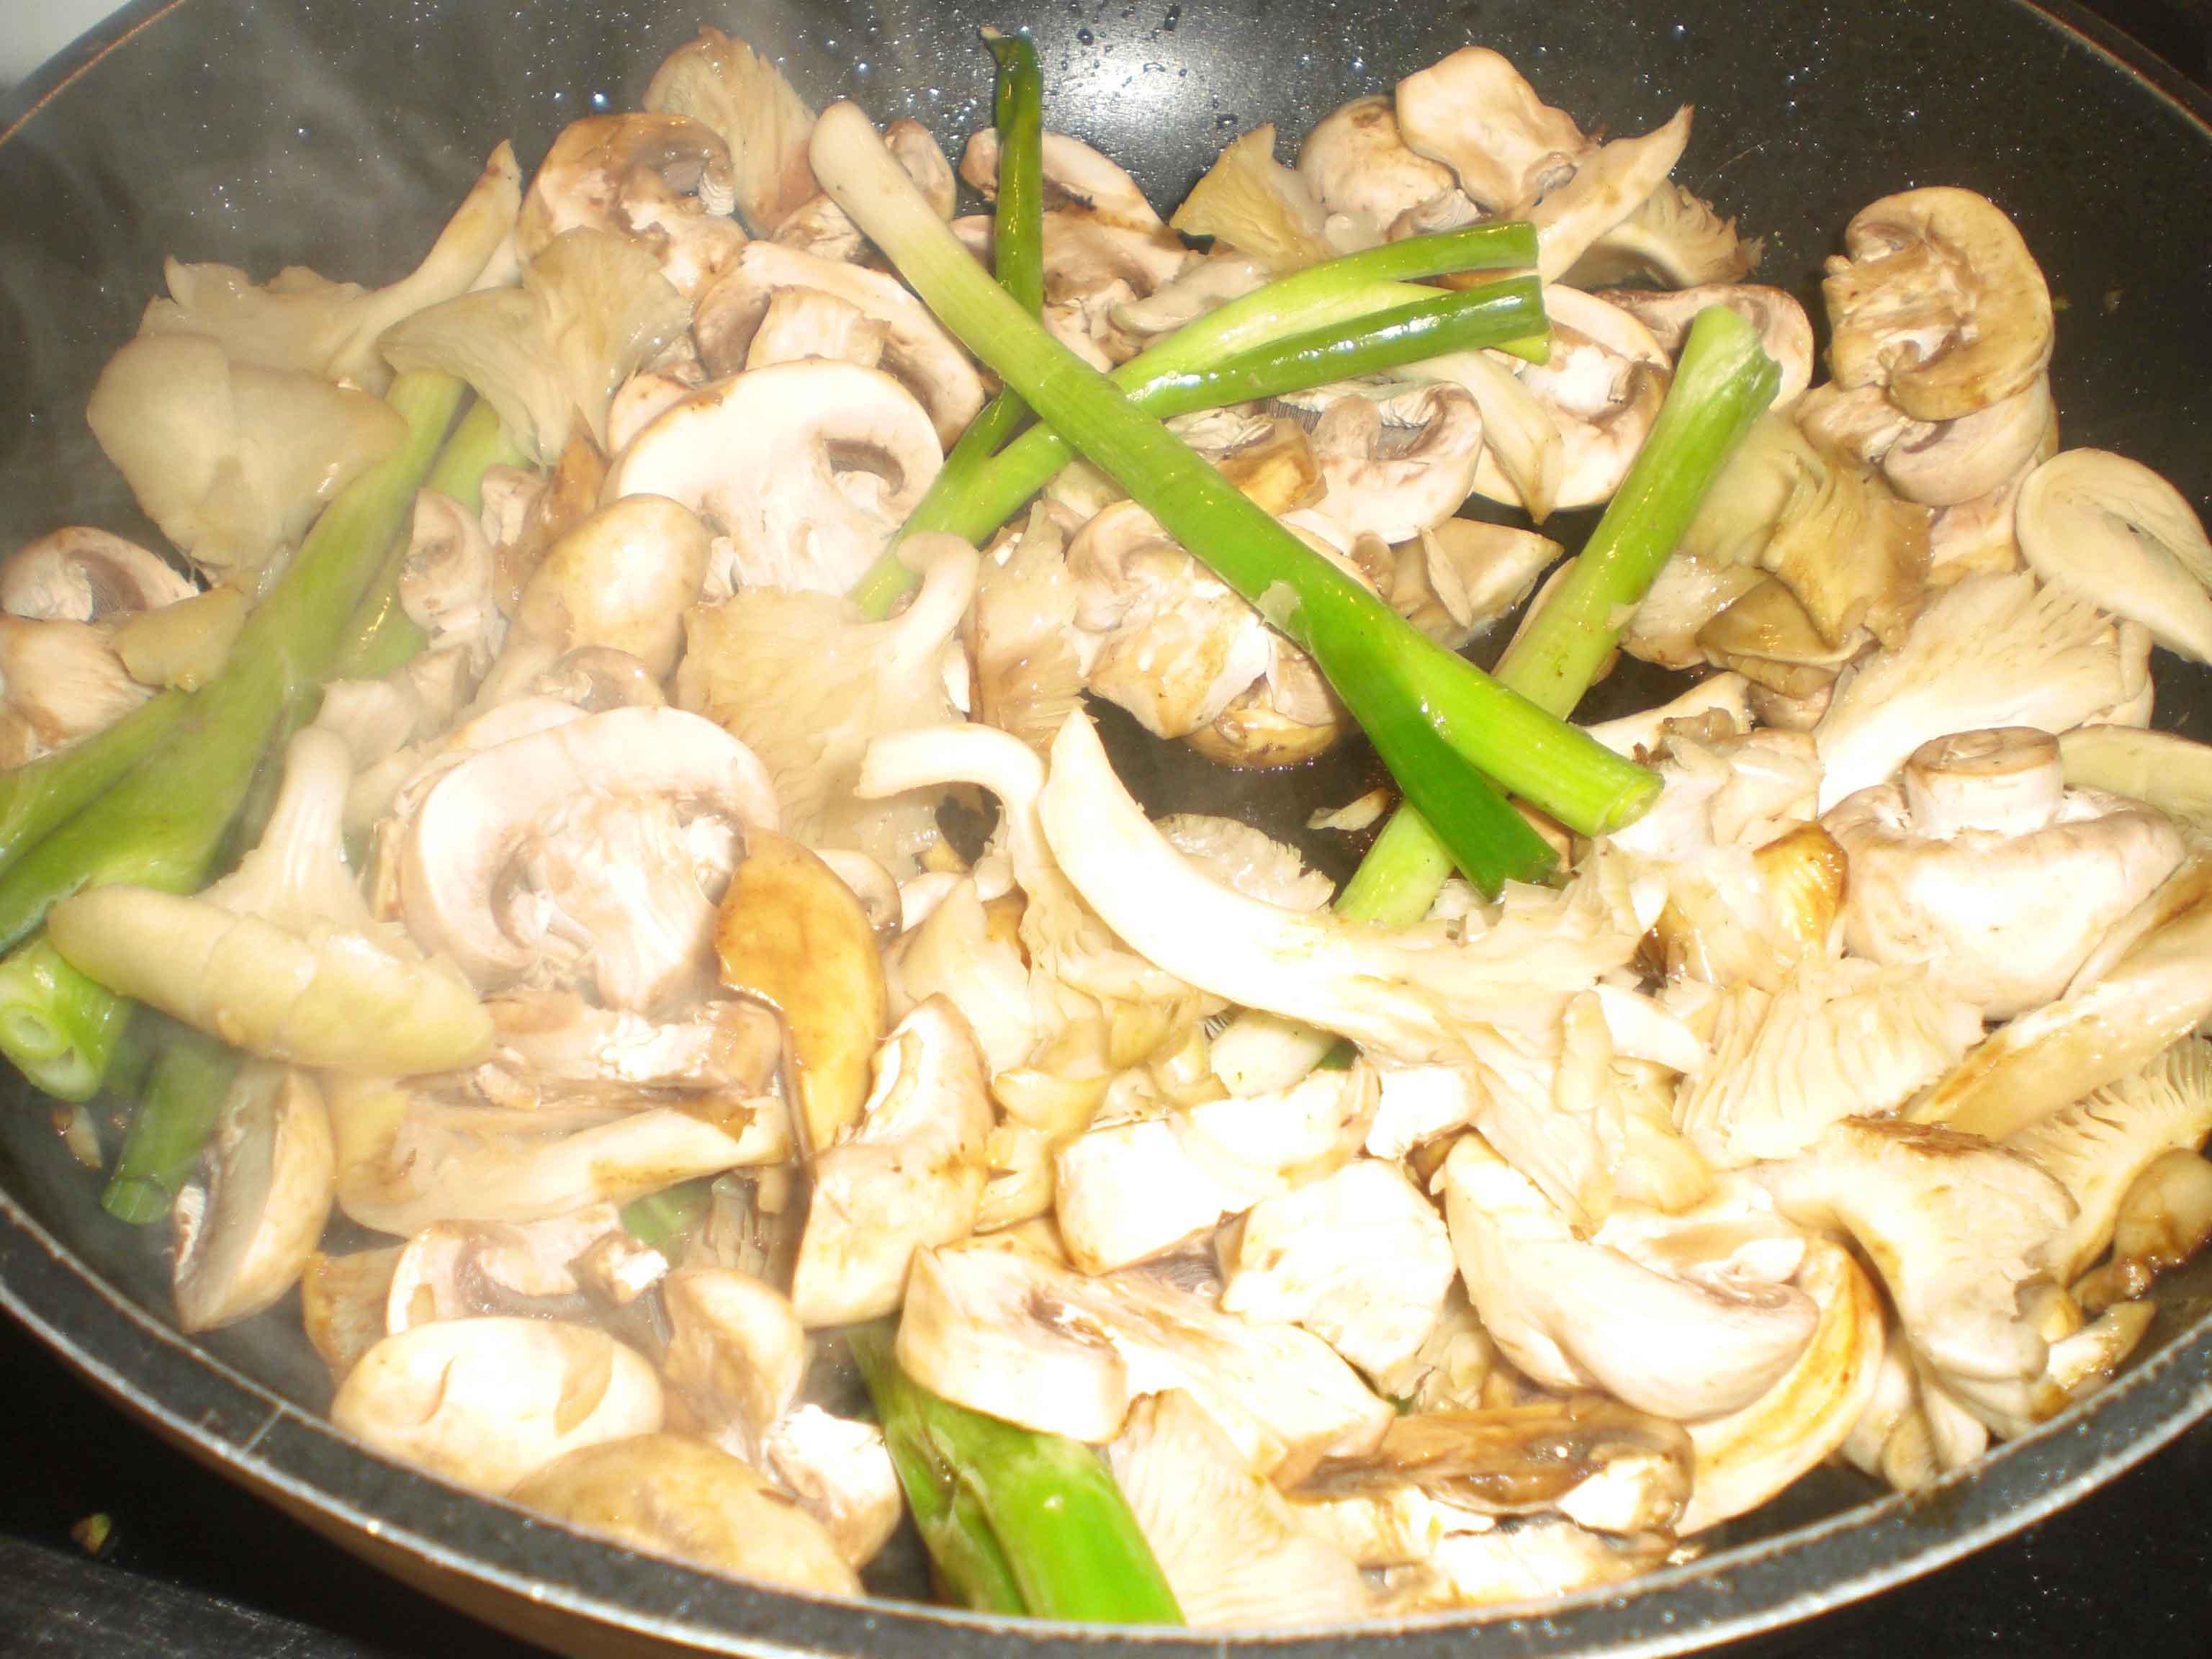 Rist svampe og løg.